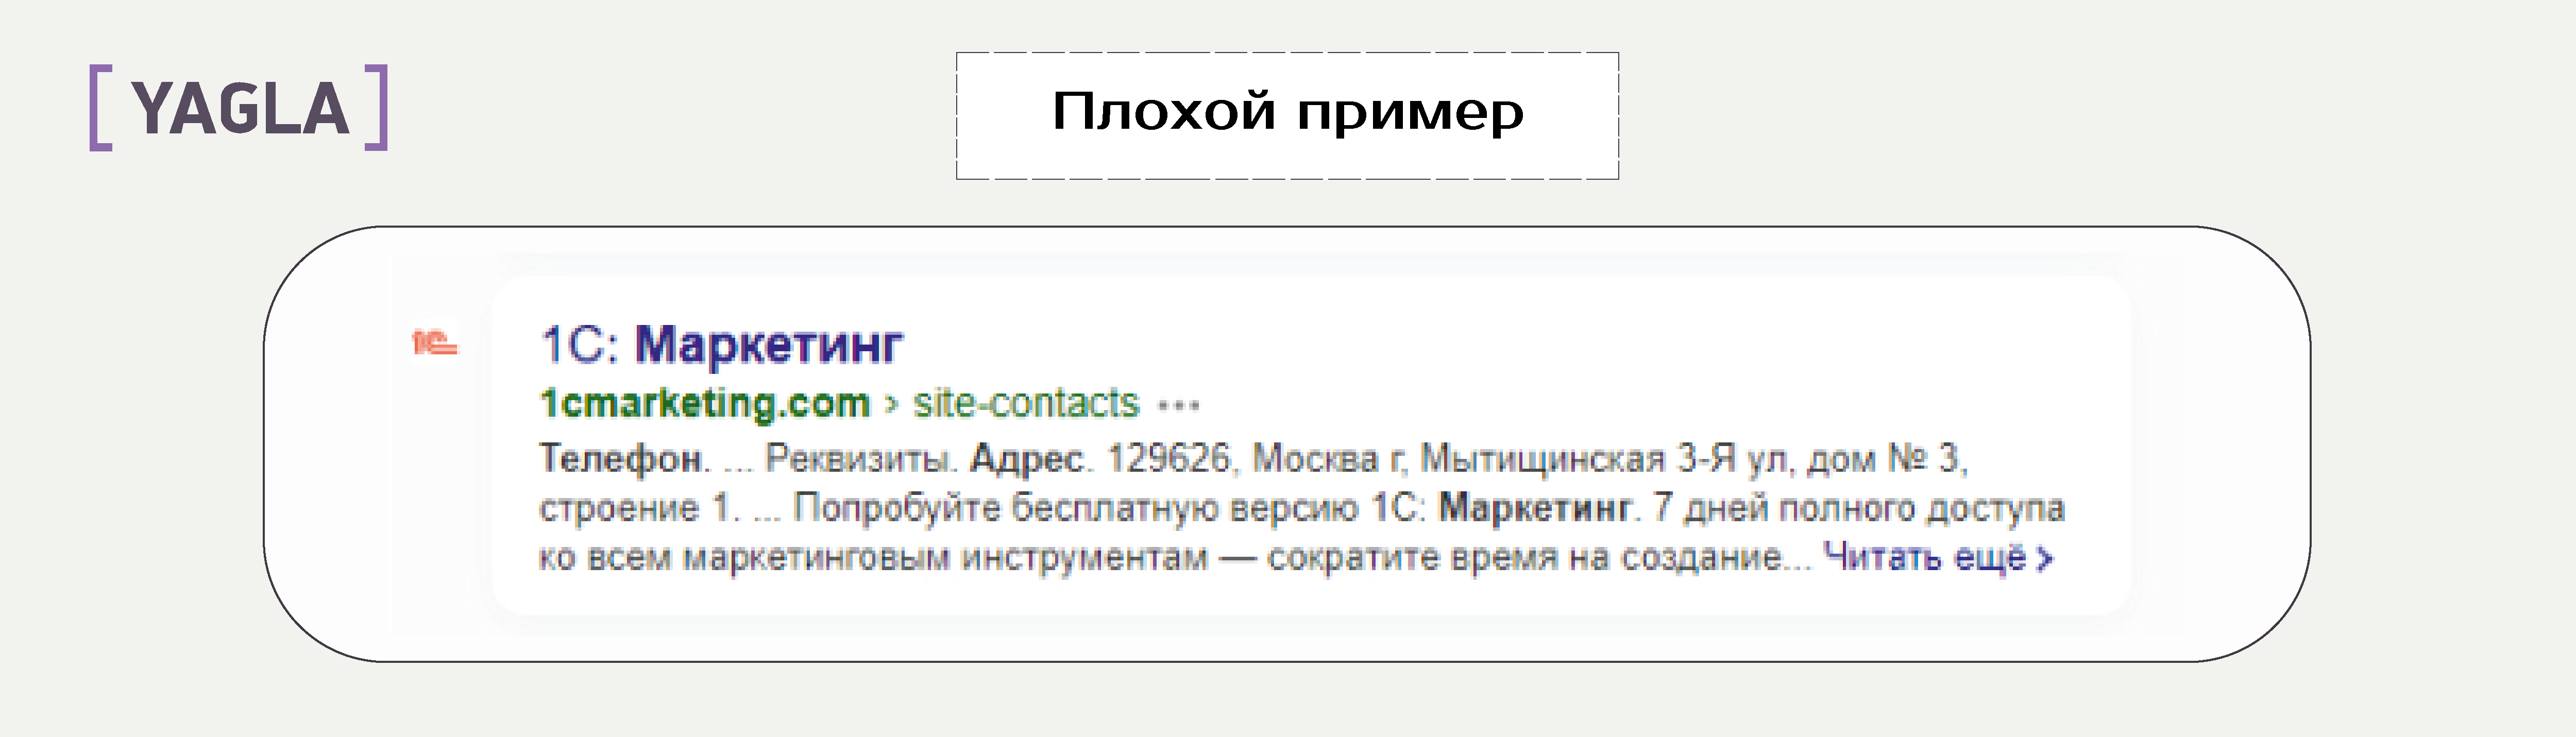 Description с контактами: пример